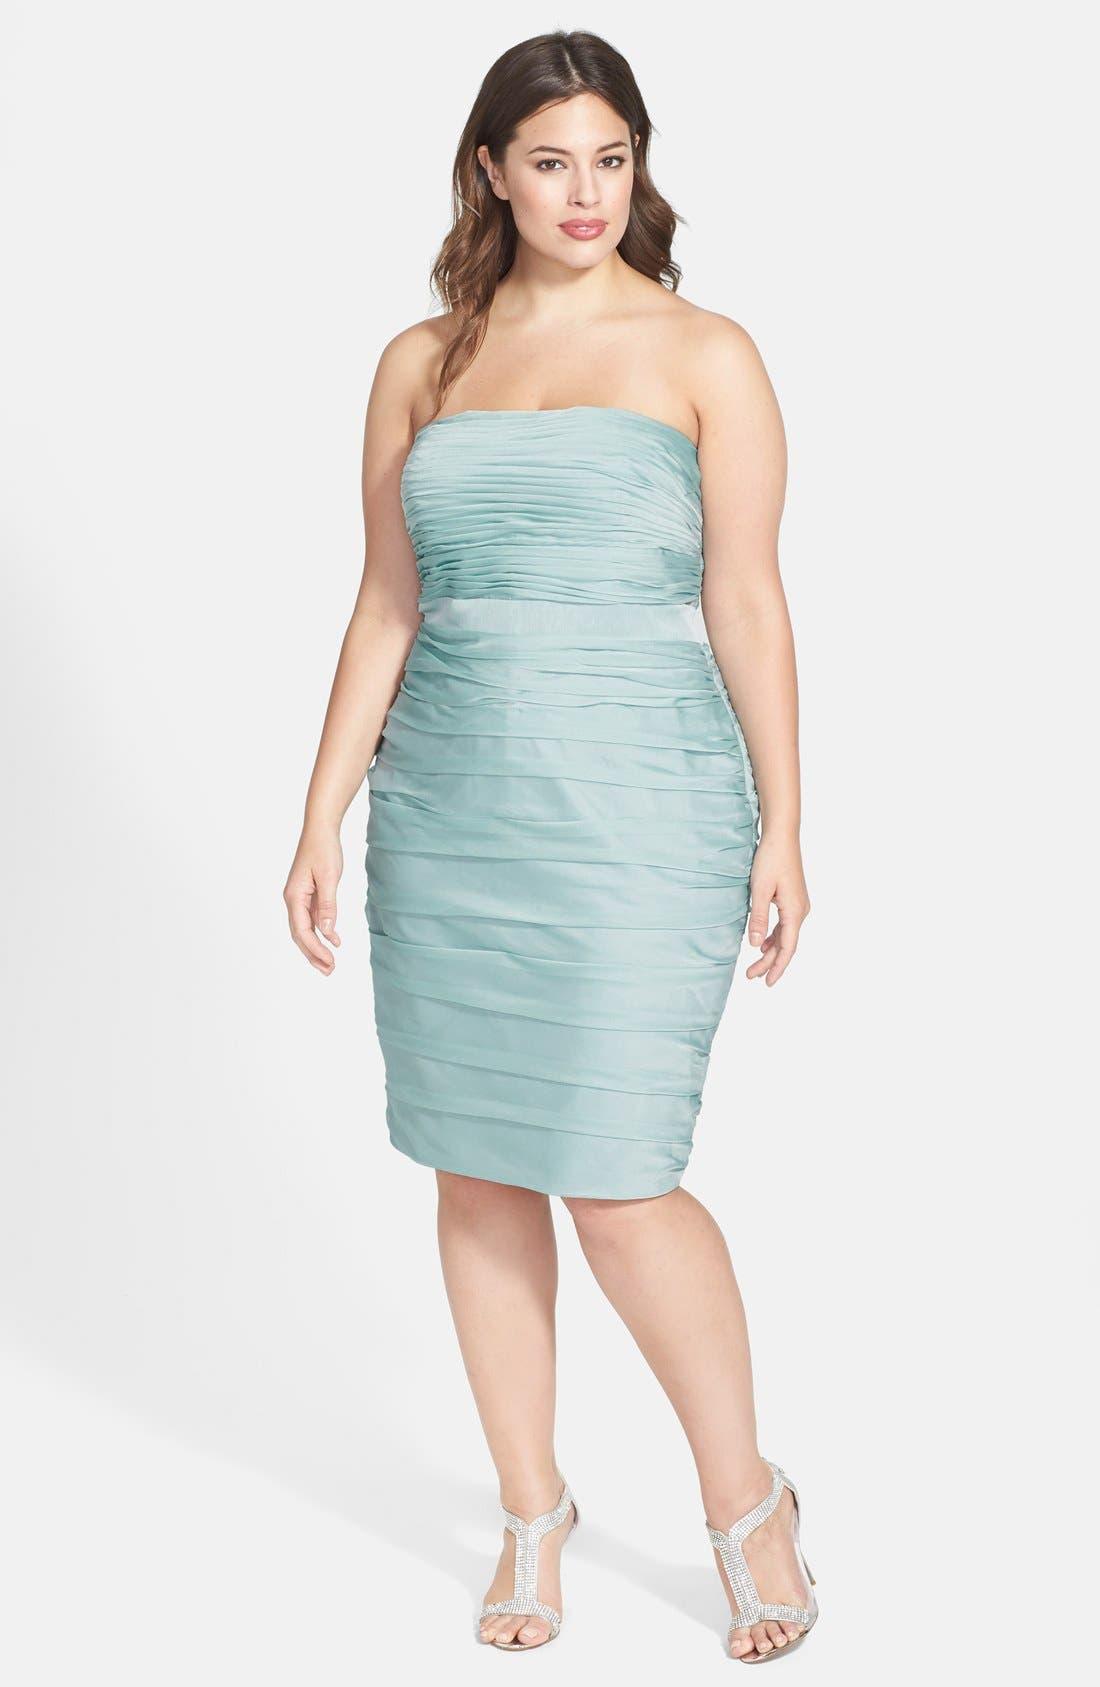 Main Image - ML Monique Lhuillier Bridesmaids Ruched Strapless Cationic Chiffon Dress (Nordstrom Exclusive) (Plus Size)